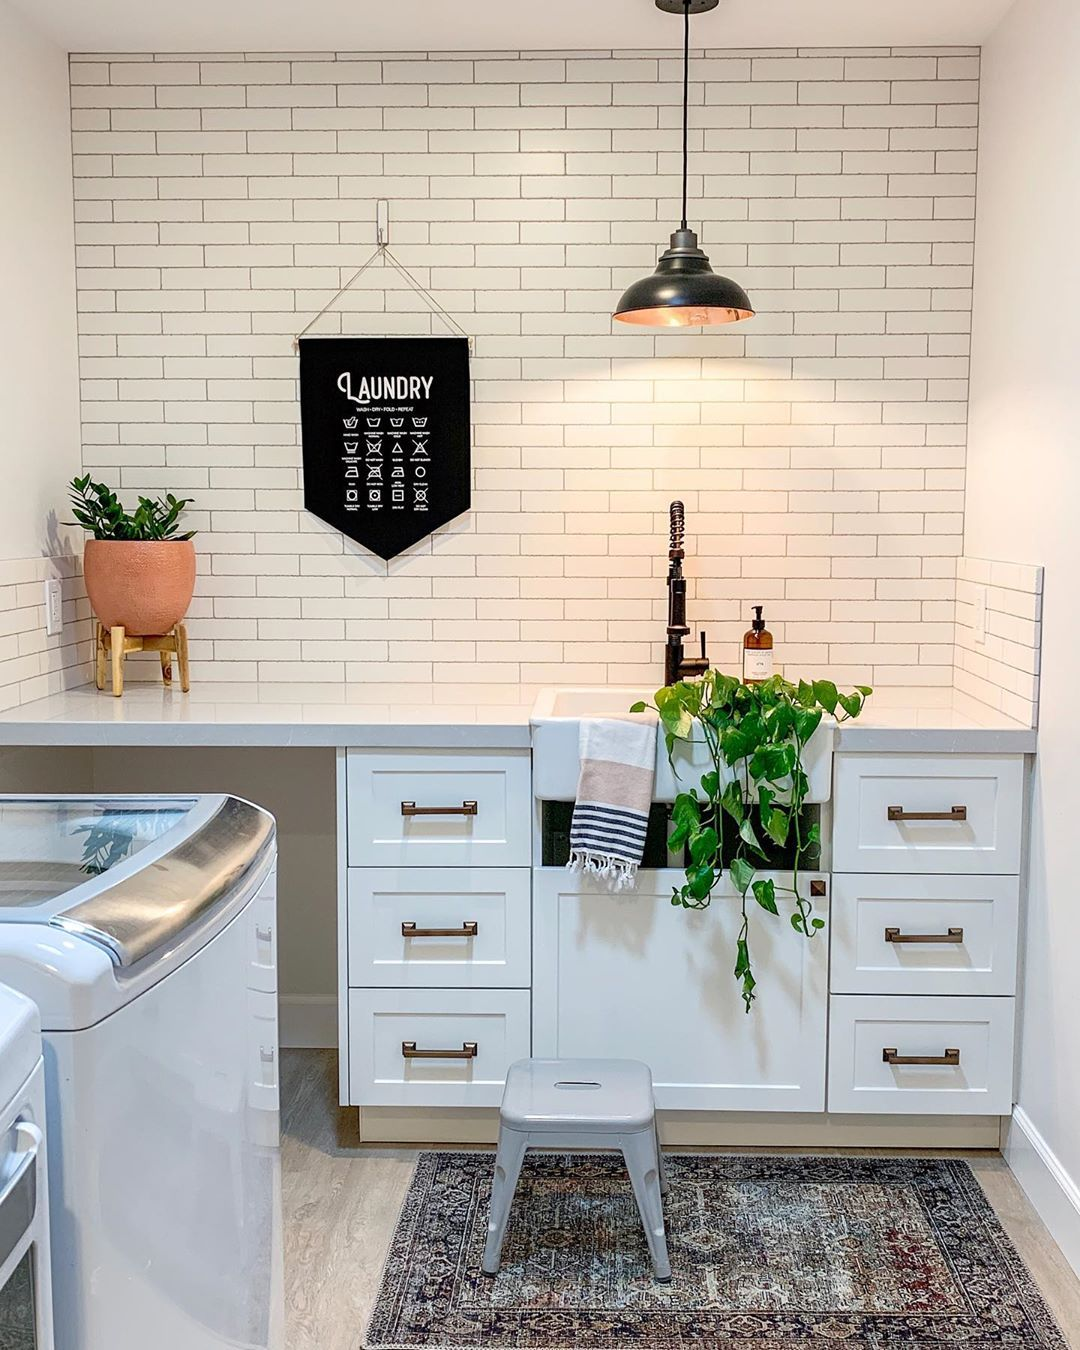 Free Room Design: Simple Cute Laundry Room Decor @1111lightlane! Click The